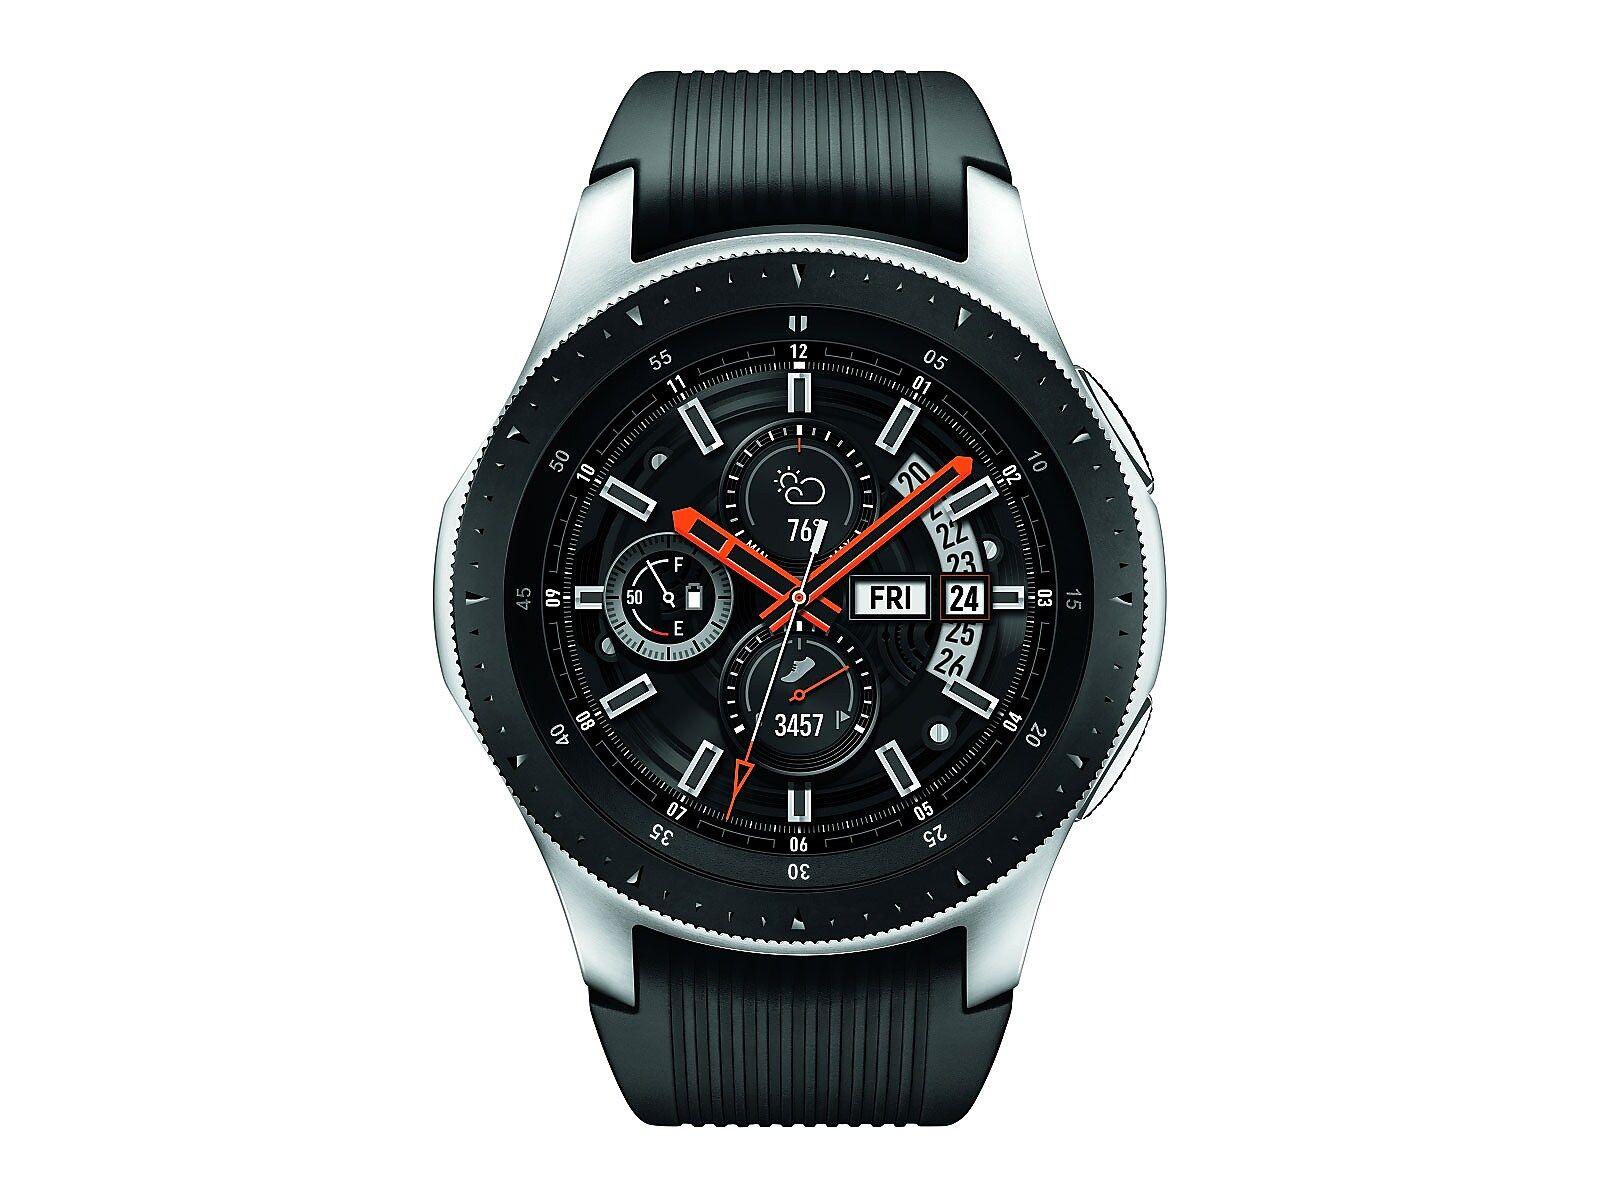 Samsung Galaxy Watch 46mm Silver 4g Lte Smartwatch Smart Watch Watches For Men Wearable Device